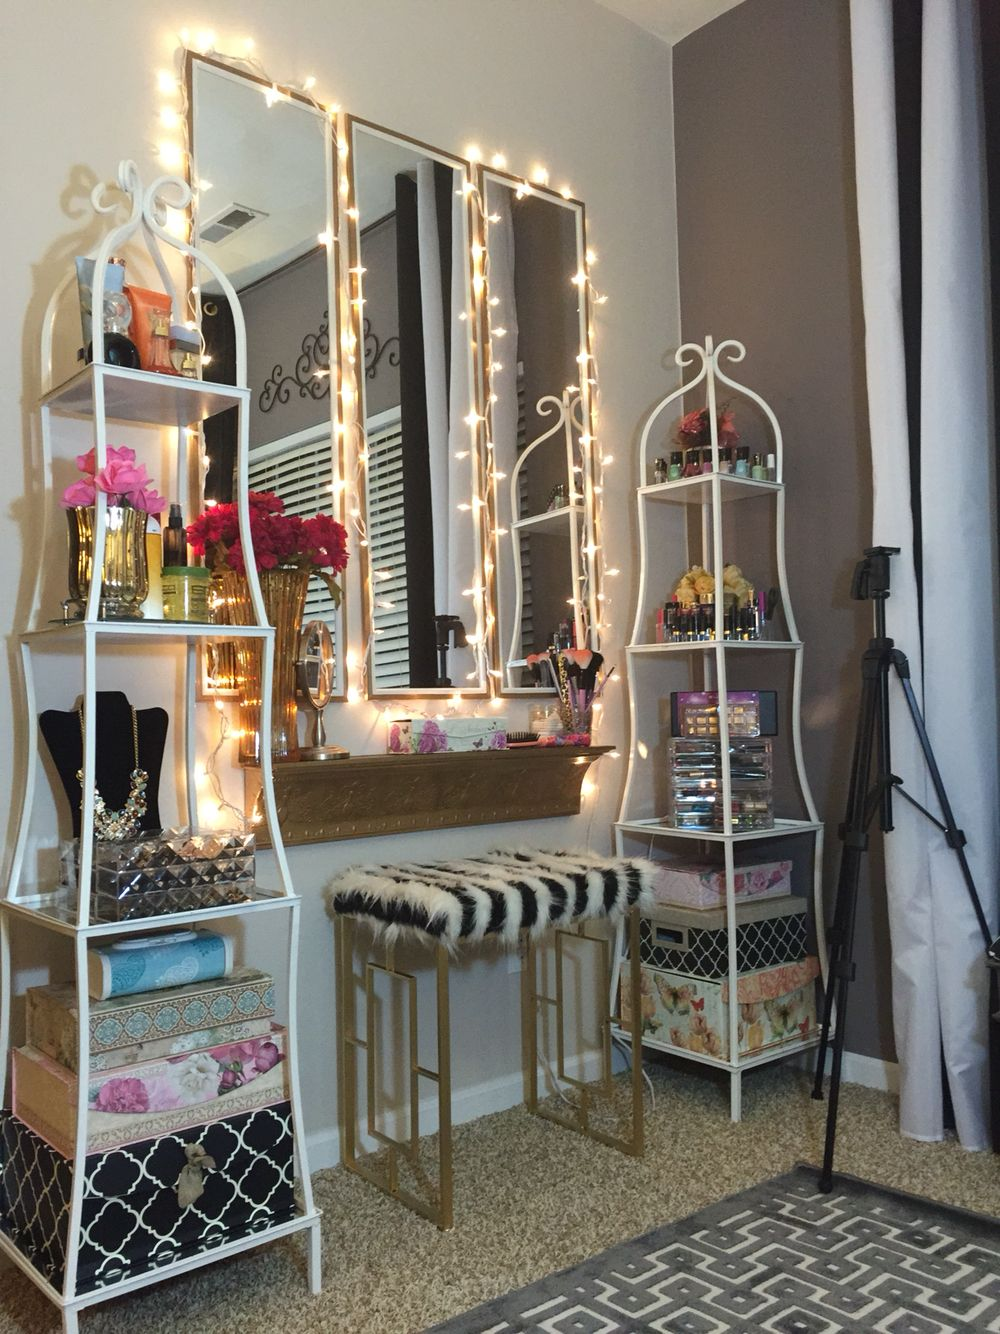 Makeup Vanity Area...Glamorous Home Office/ Beauty Room...Watch